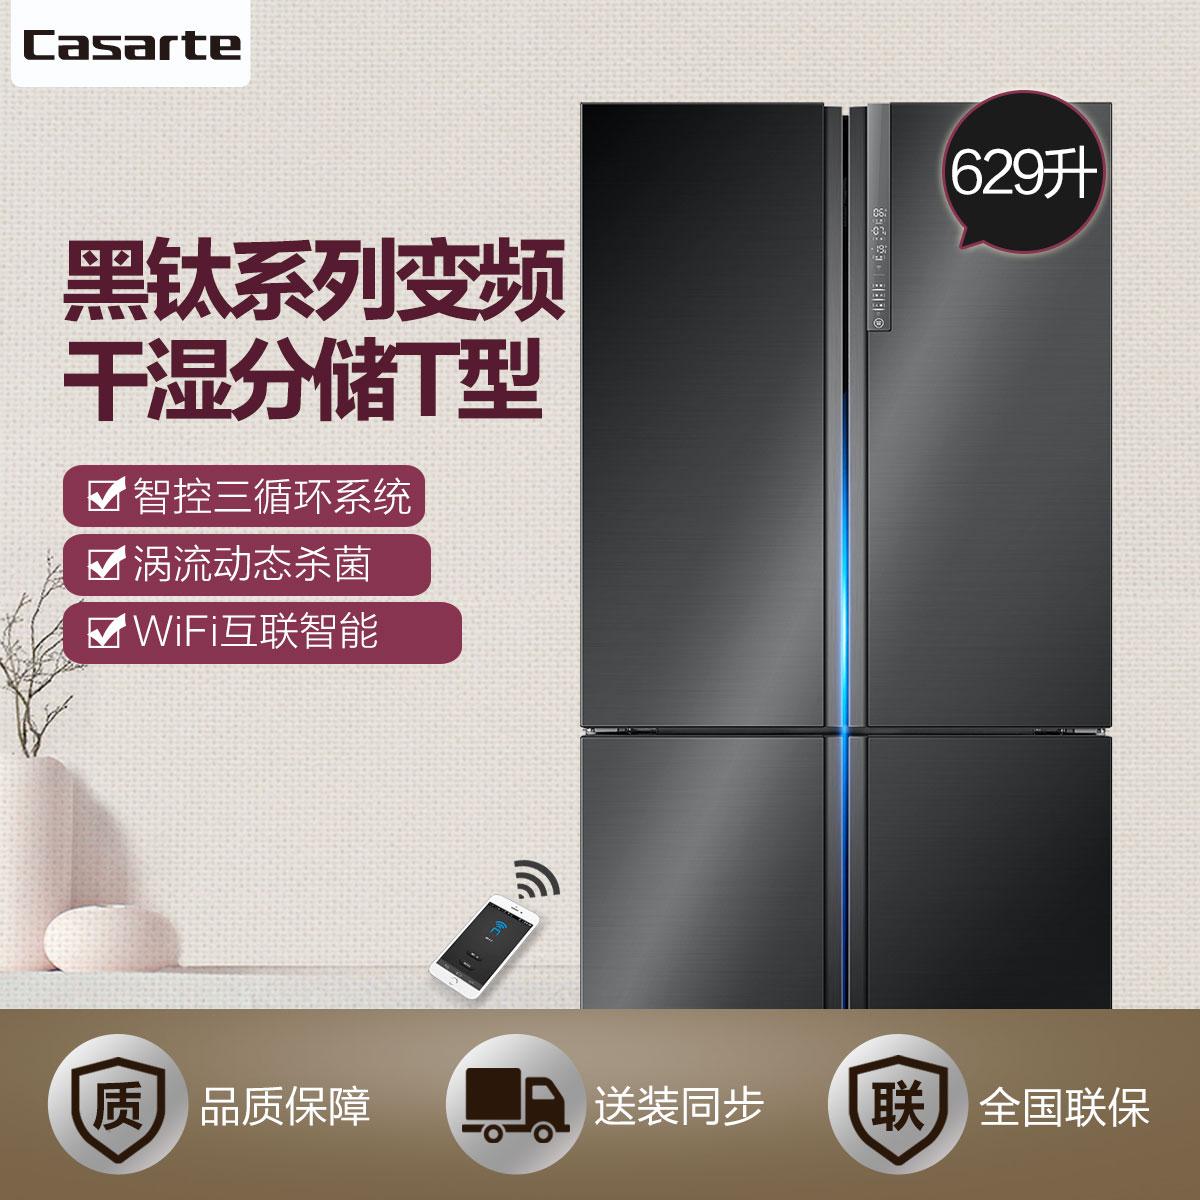 Casarte/卡萨帝 冰箱 BCD-629WDSTU1 629升十字对开门变频风冷无霜冰箱